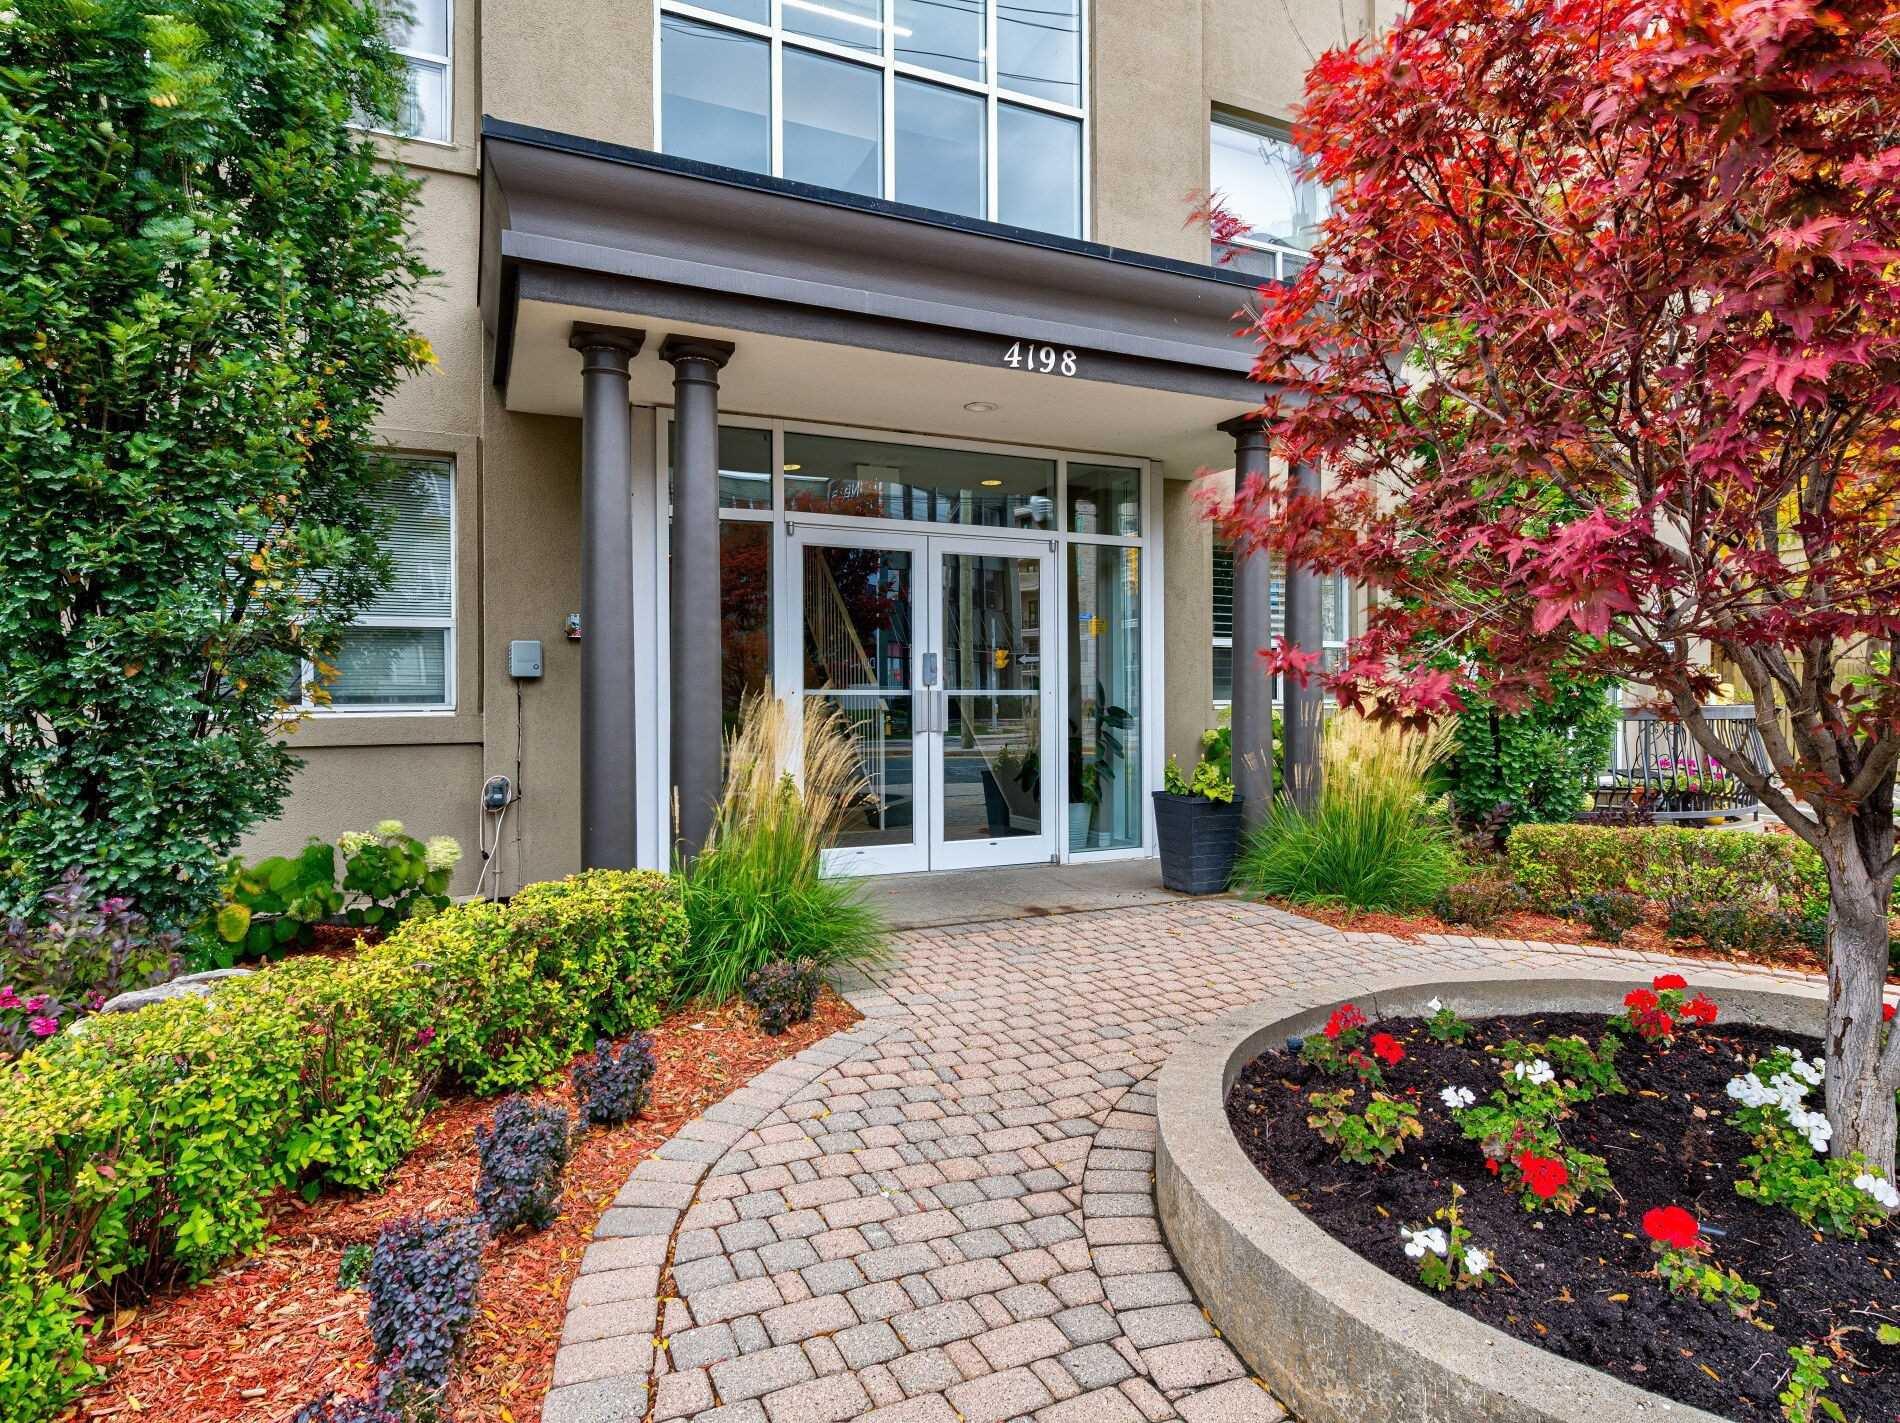 Main Photo: 306 4198 W Dundas Street in Toronto: Edenbridge-Humber Valley Condo for sale (Toronto W08)  : MLS®# W4951061